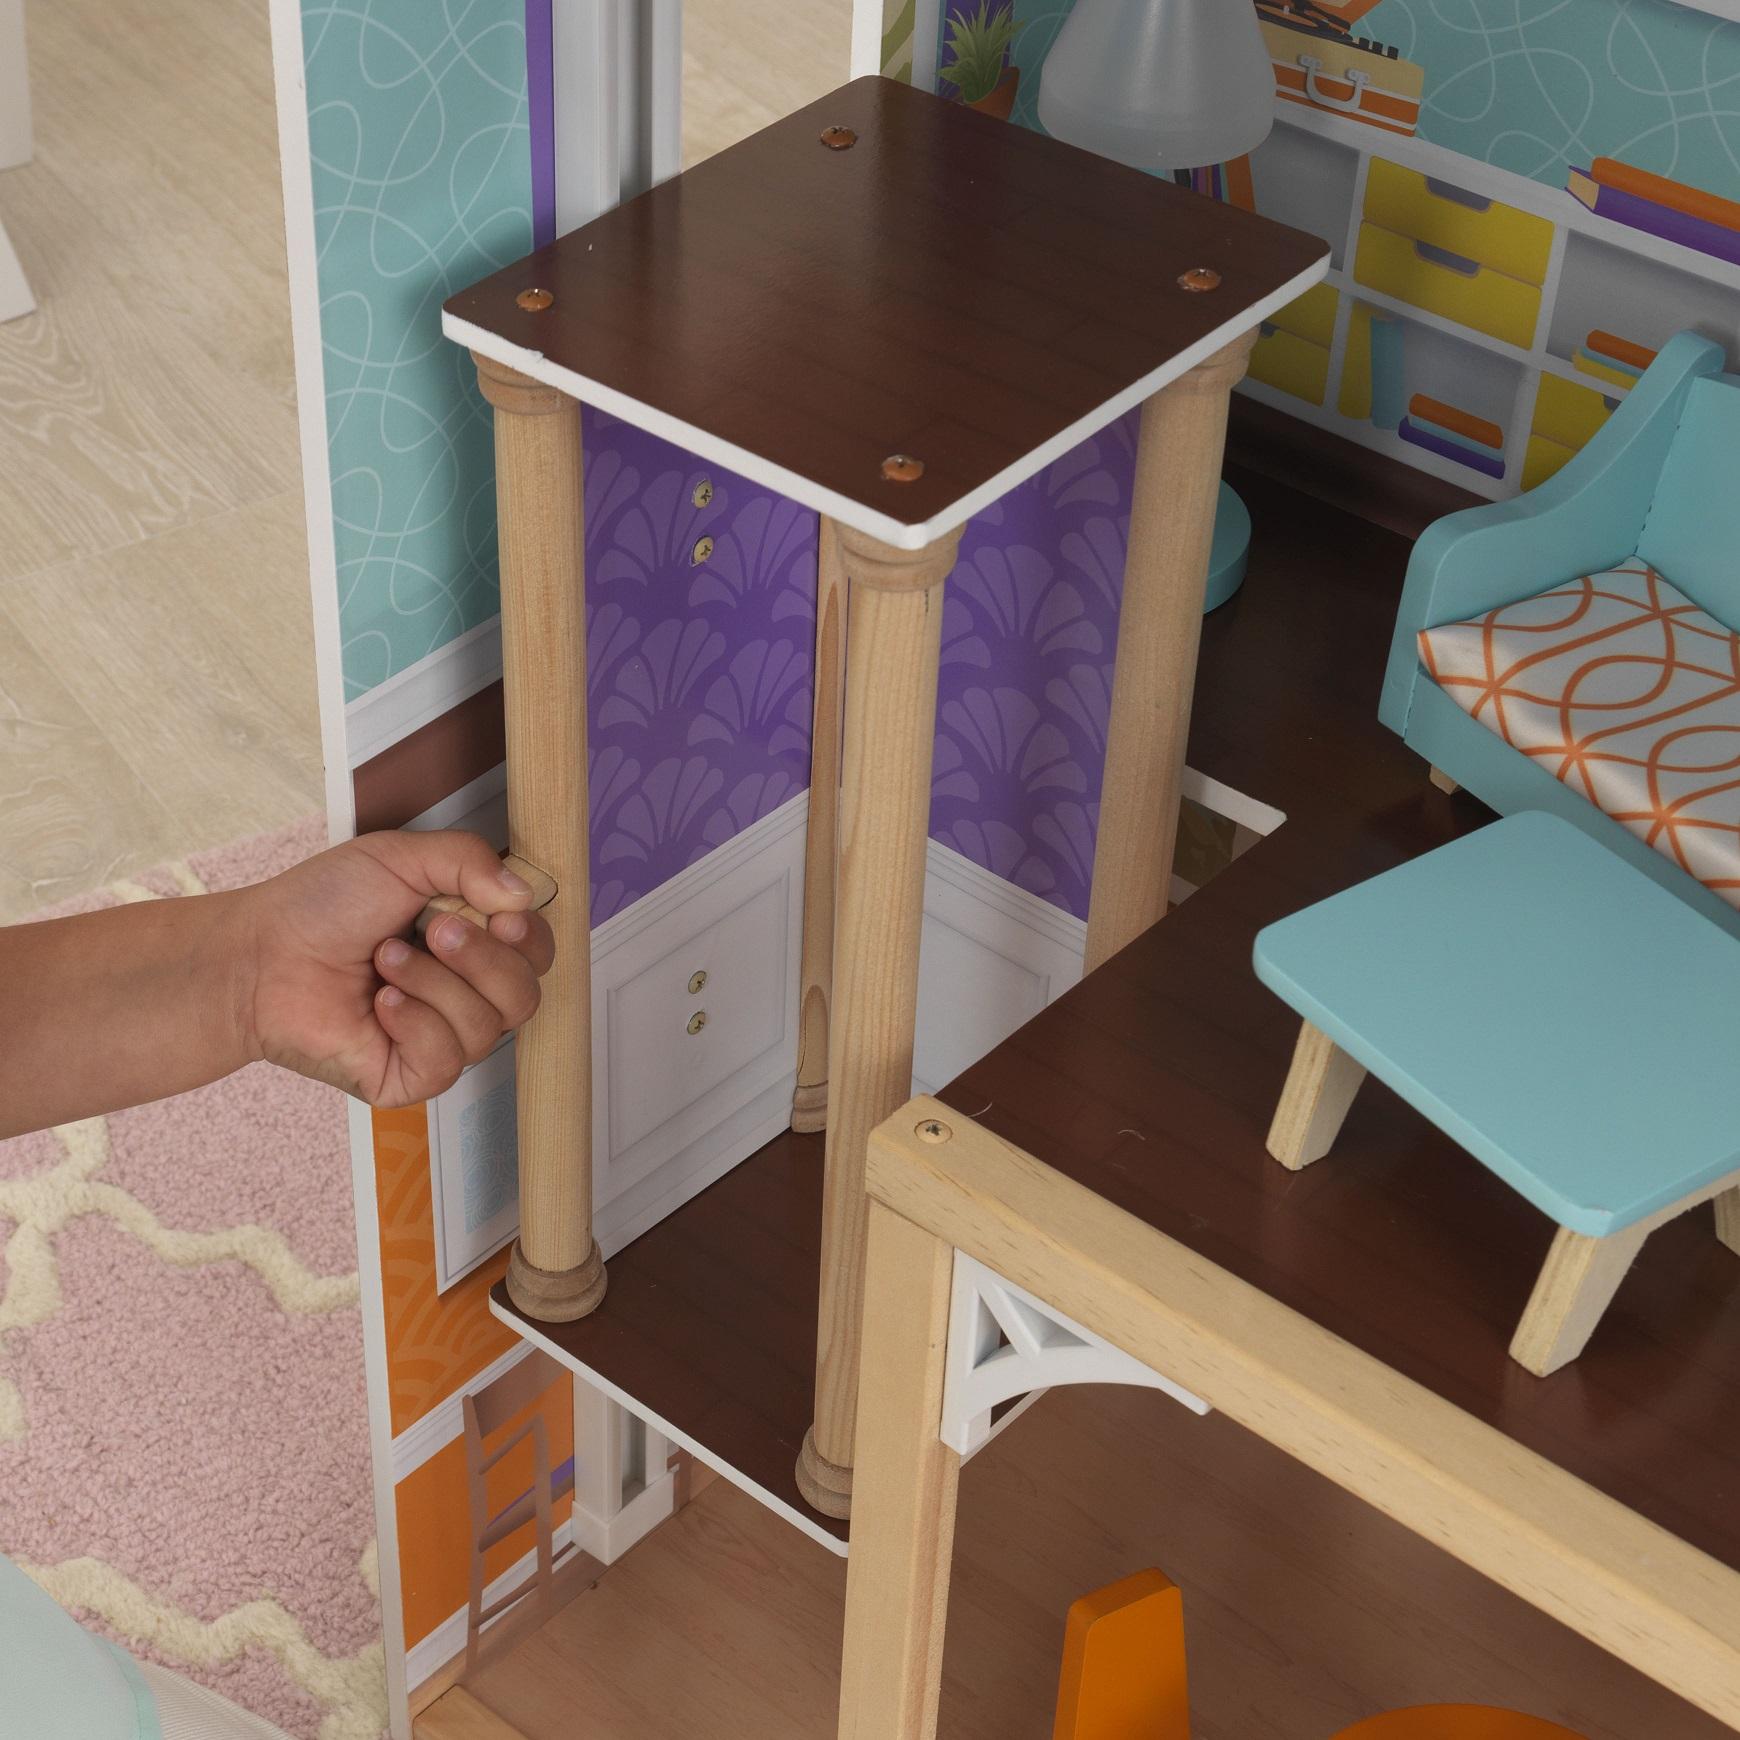 Detalle del ascensor de kidkraft casa de muñecas avery 65943